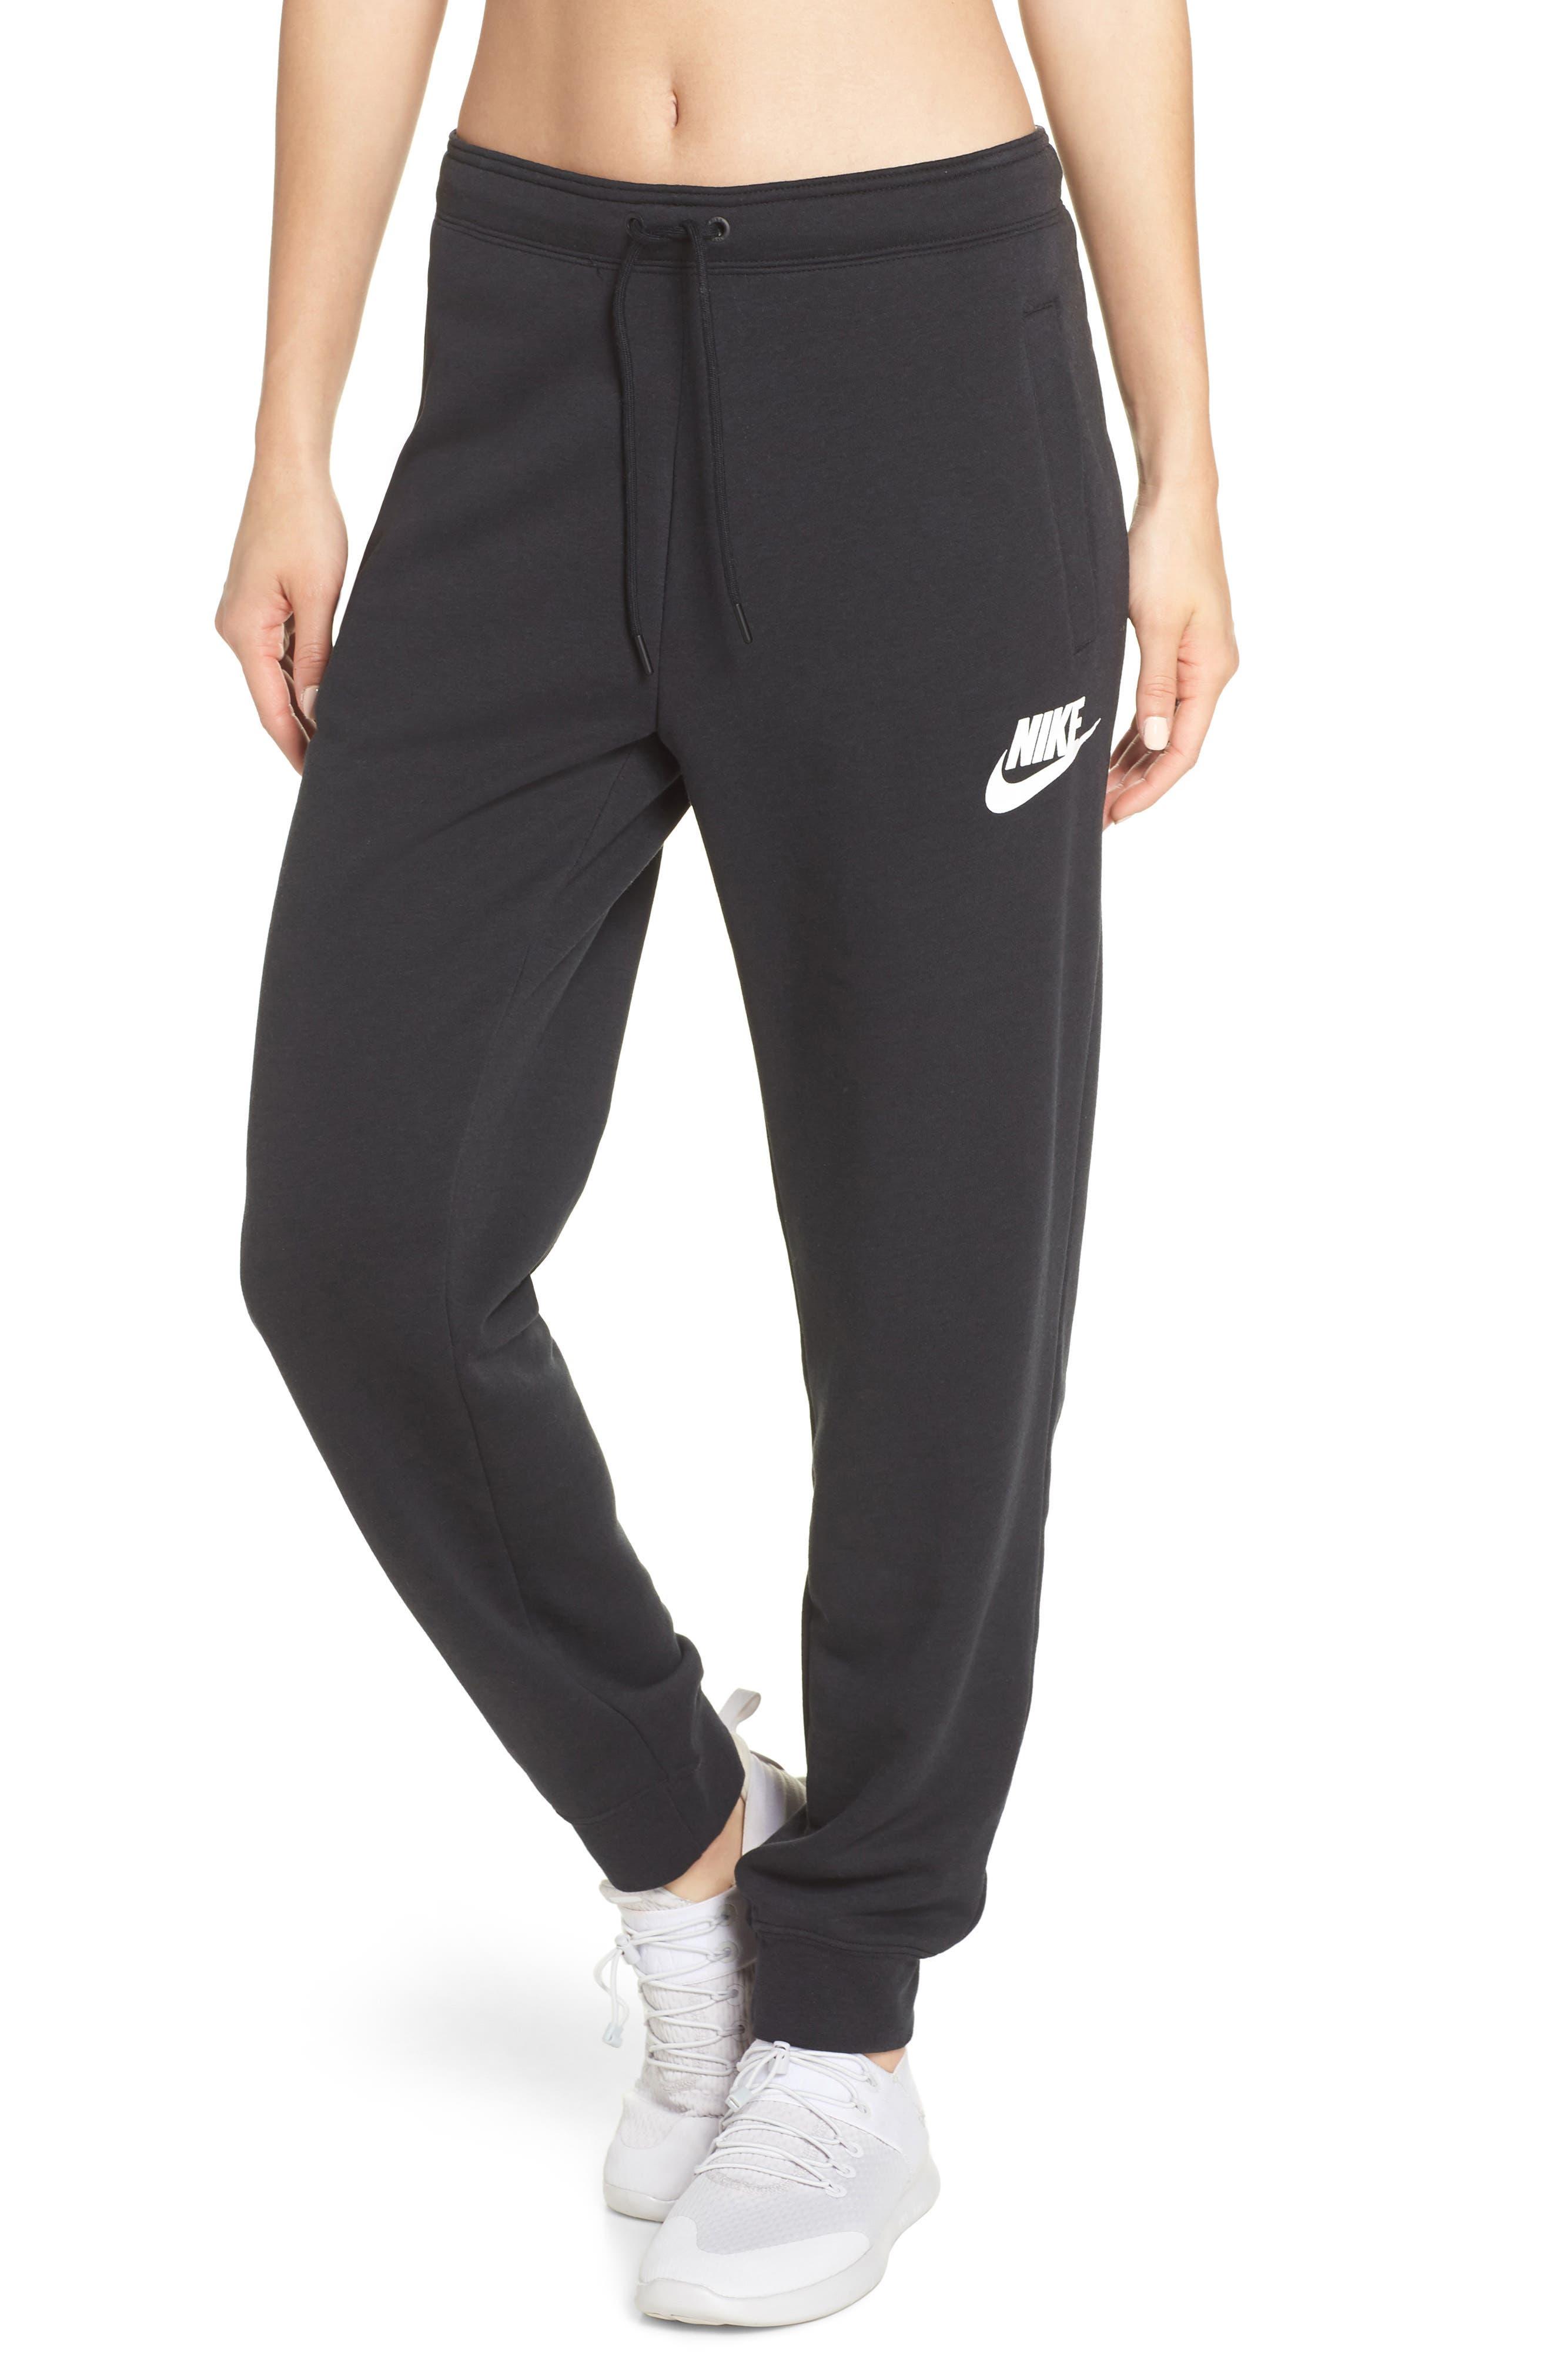 NIKE Sportswear Rally Jogger Pants, Main, color, 010